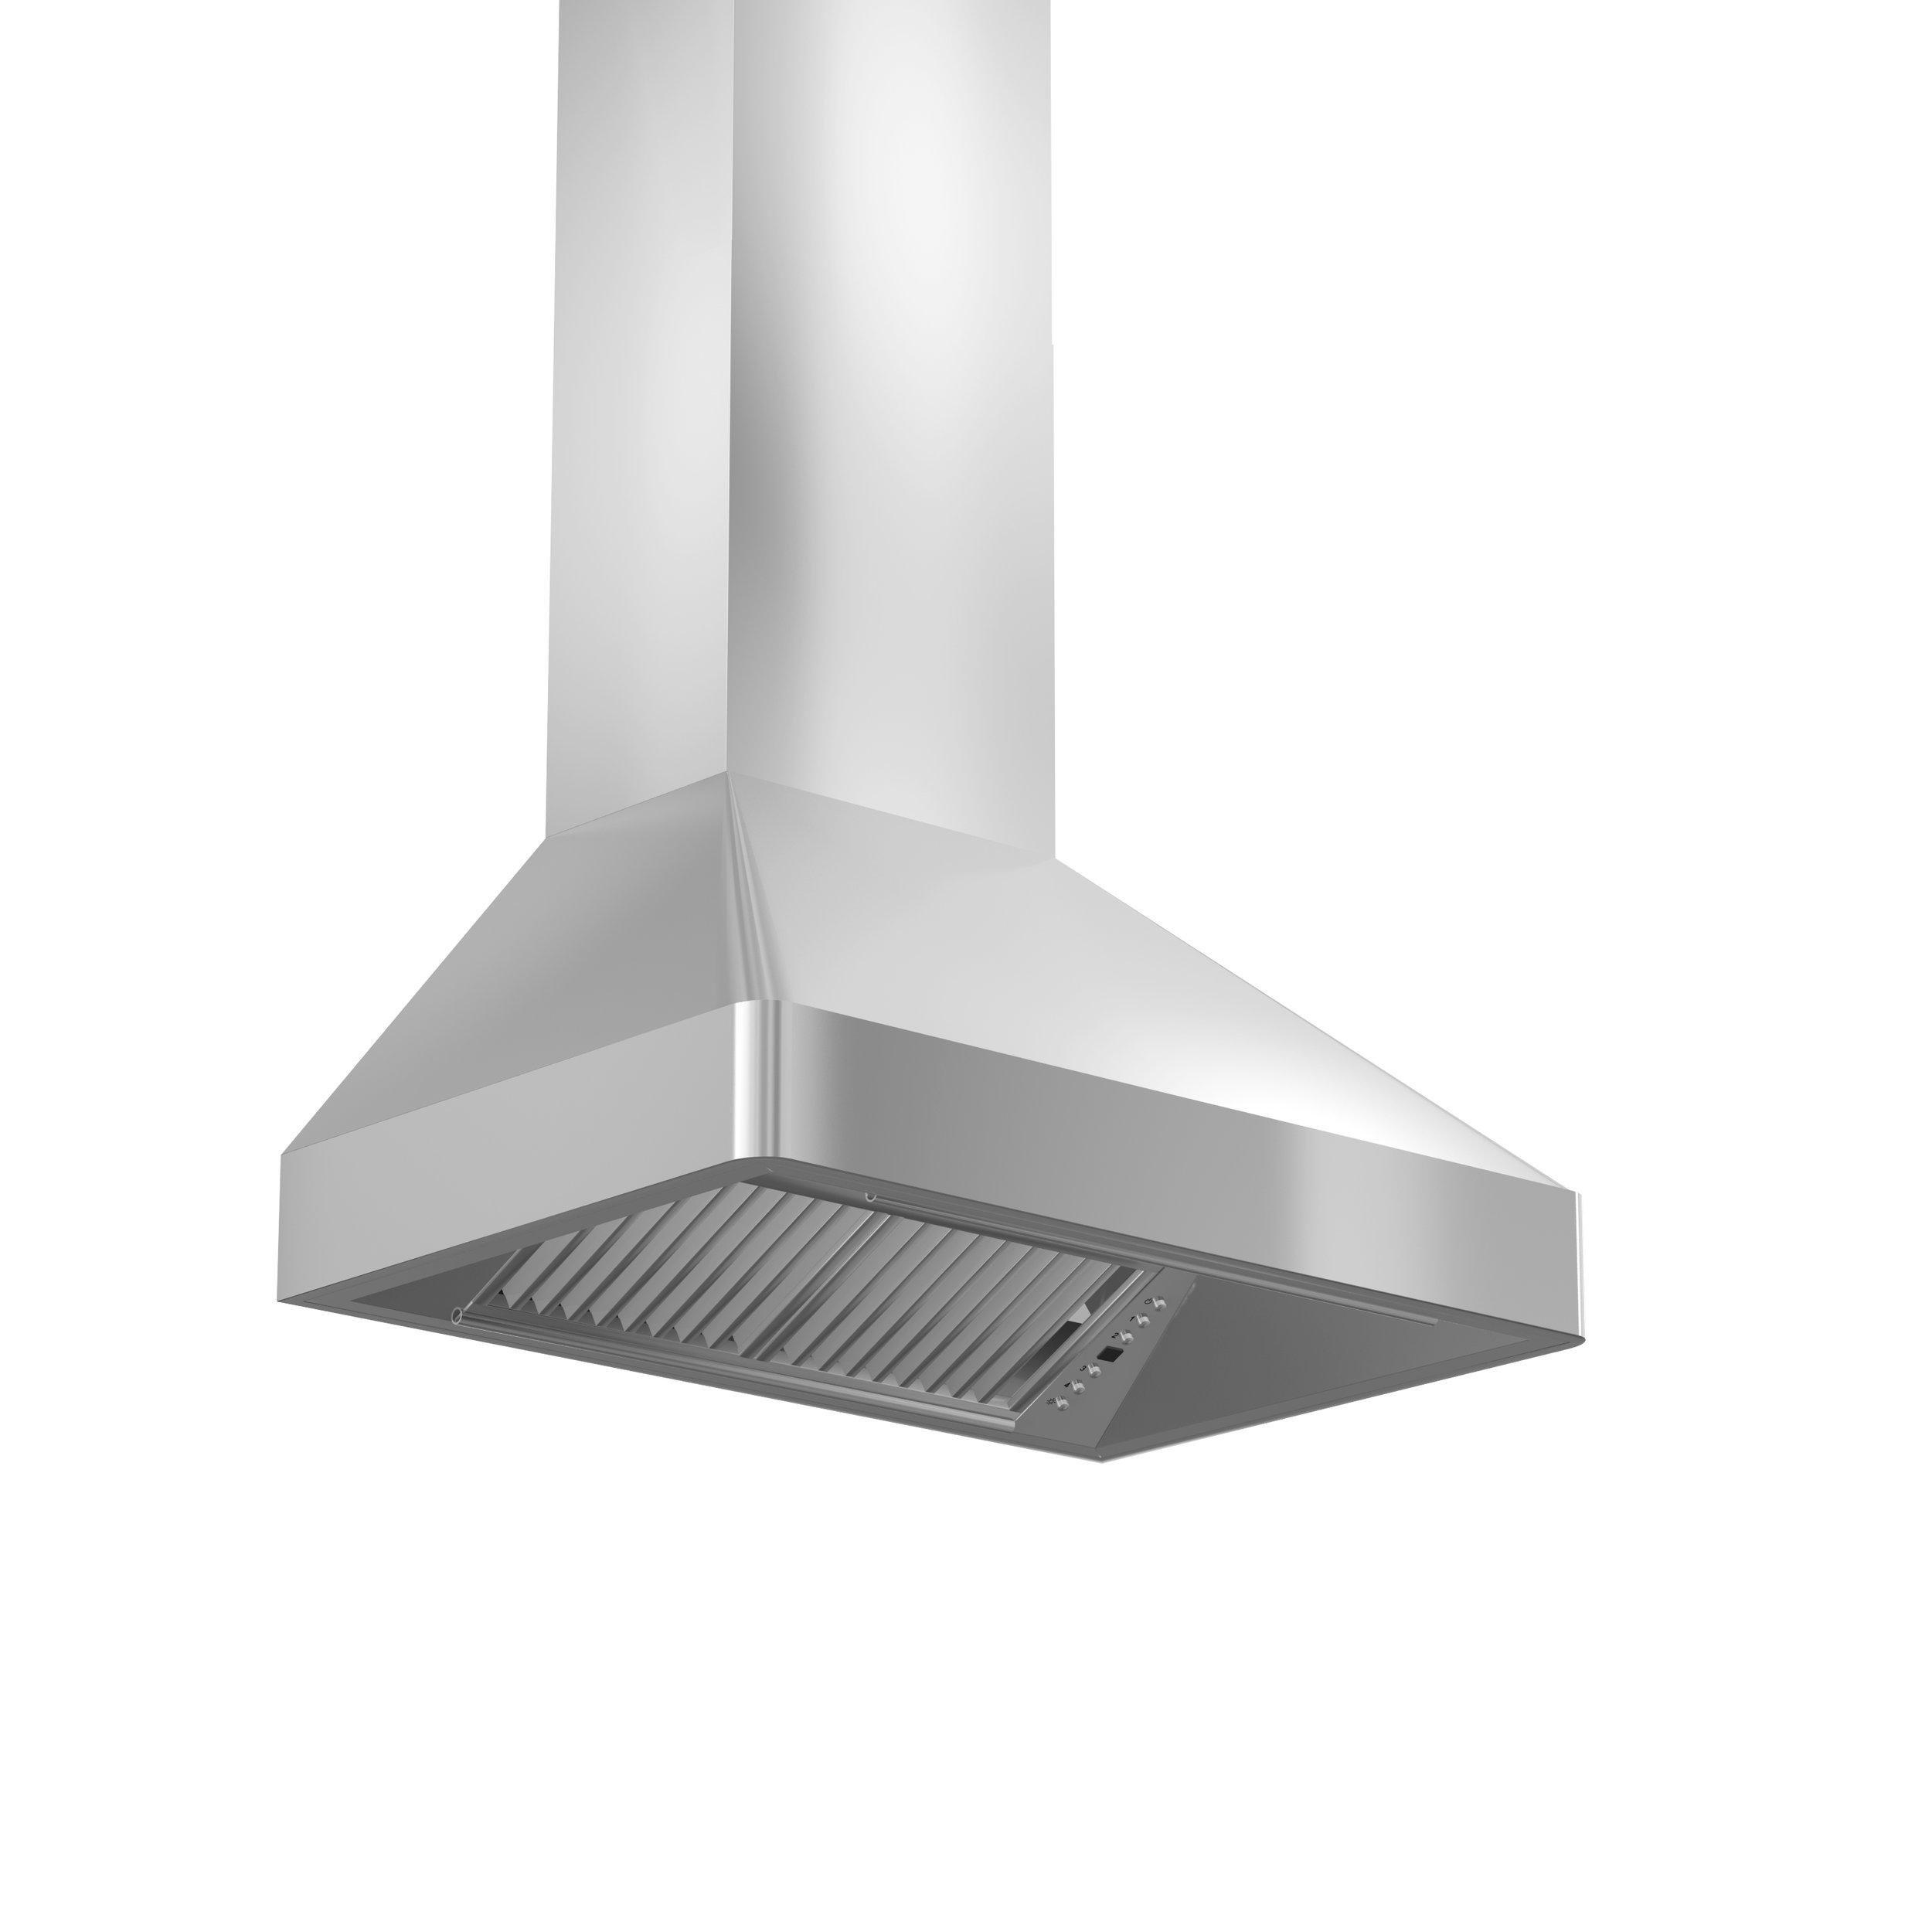 zline-stainless-steel-wall-mounted-range-hood-9597-side-under.jpg